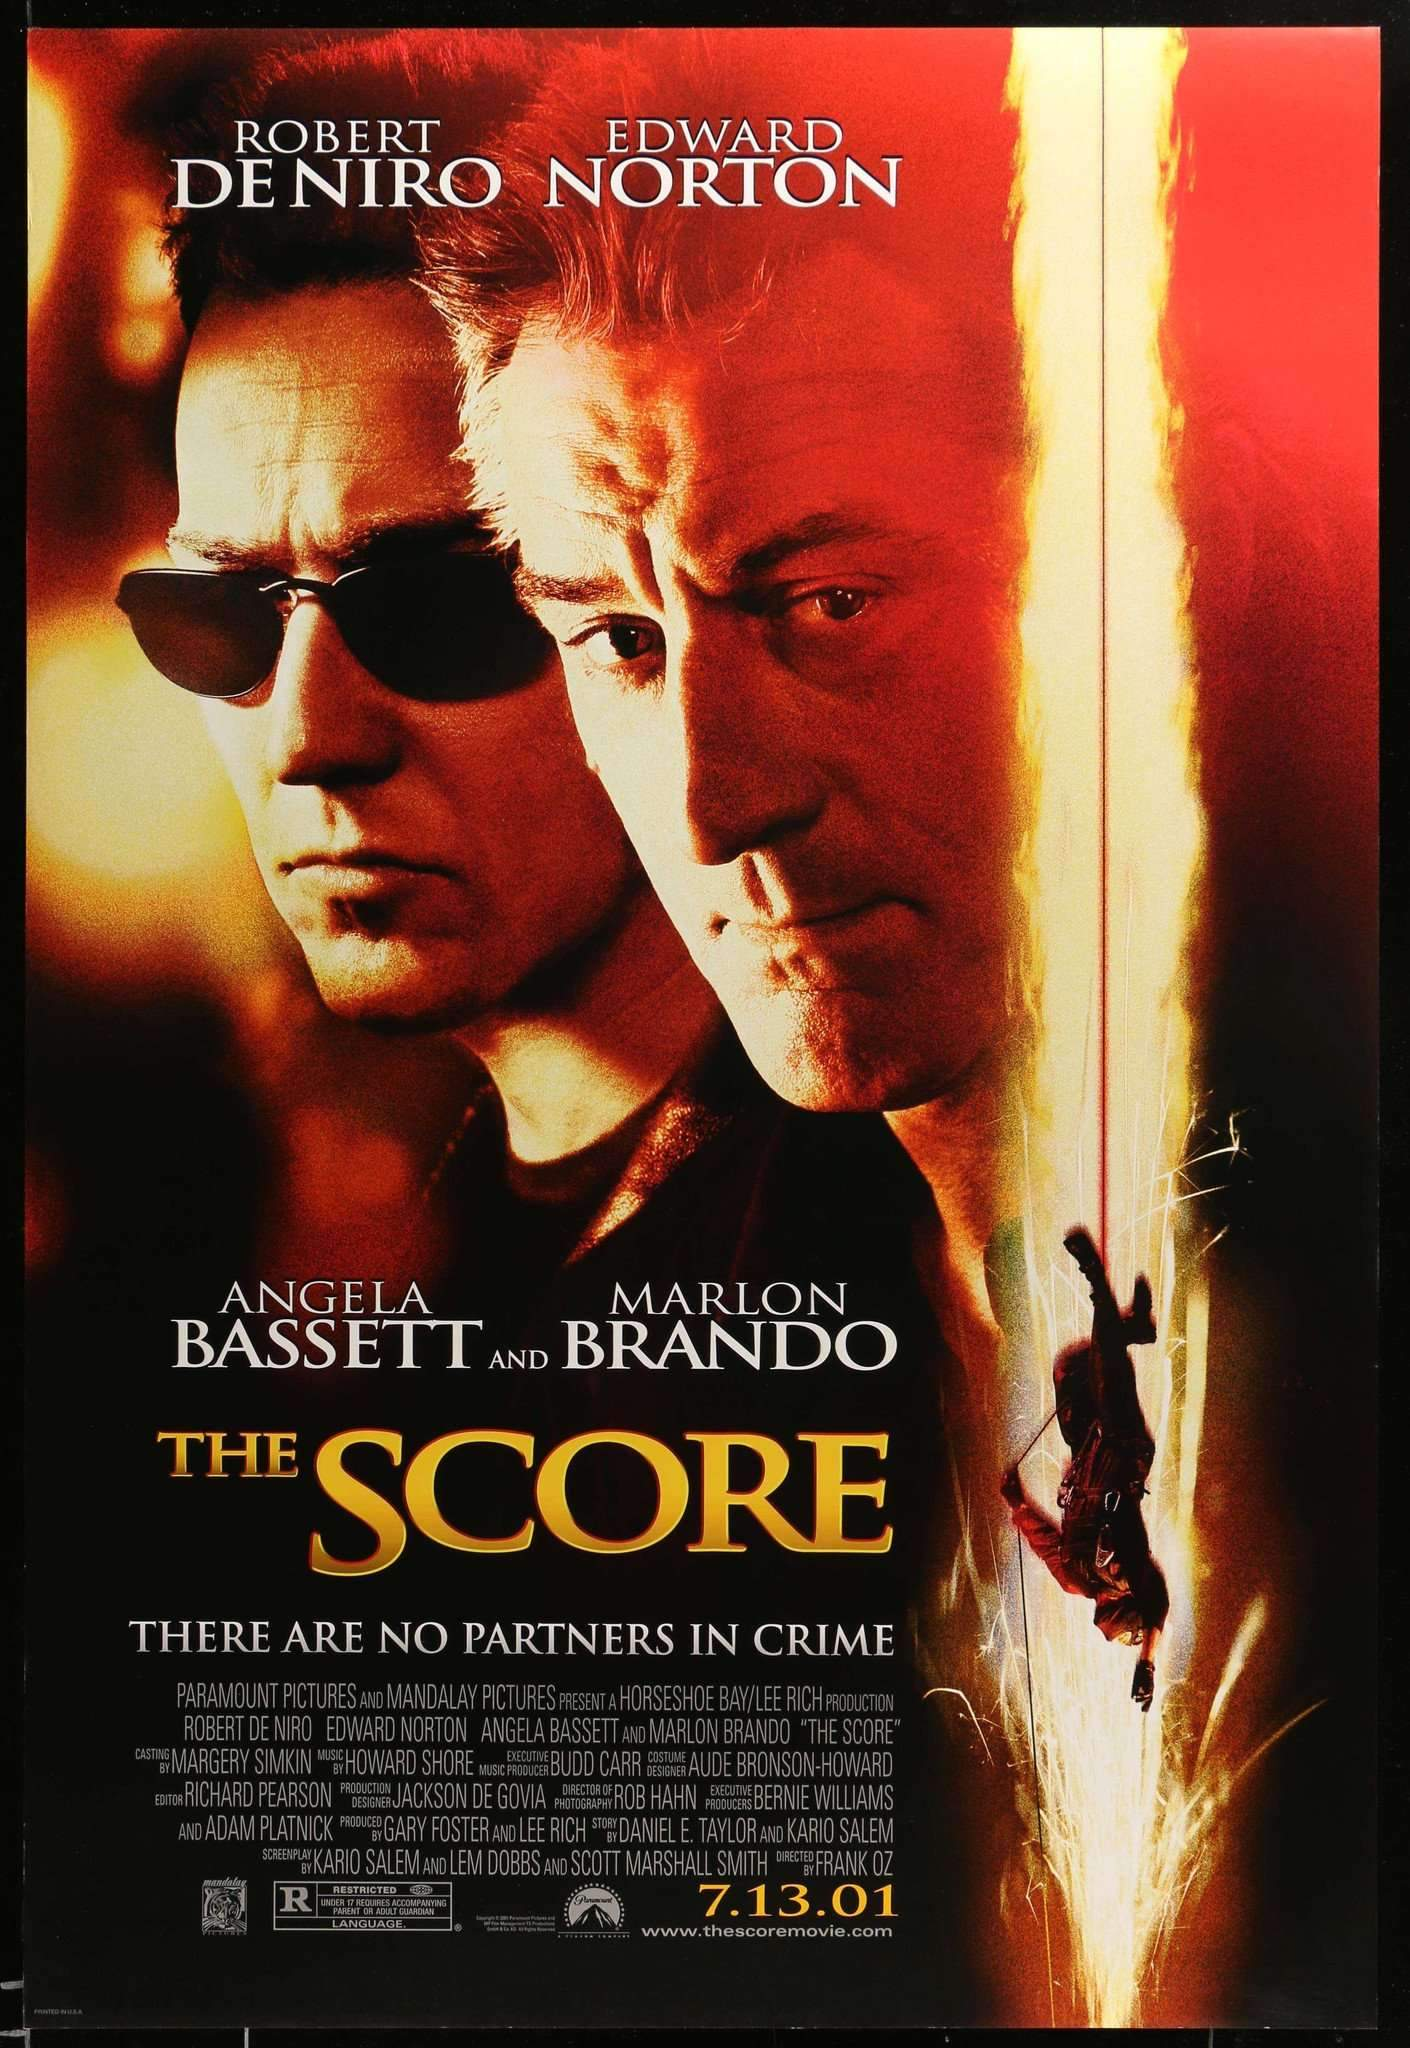 The_Score_original_film_art_spo_2000x.jpg